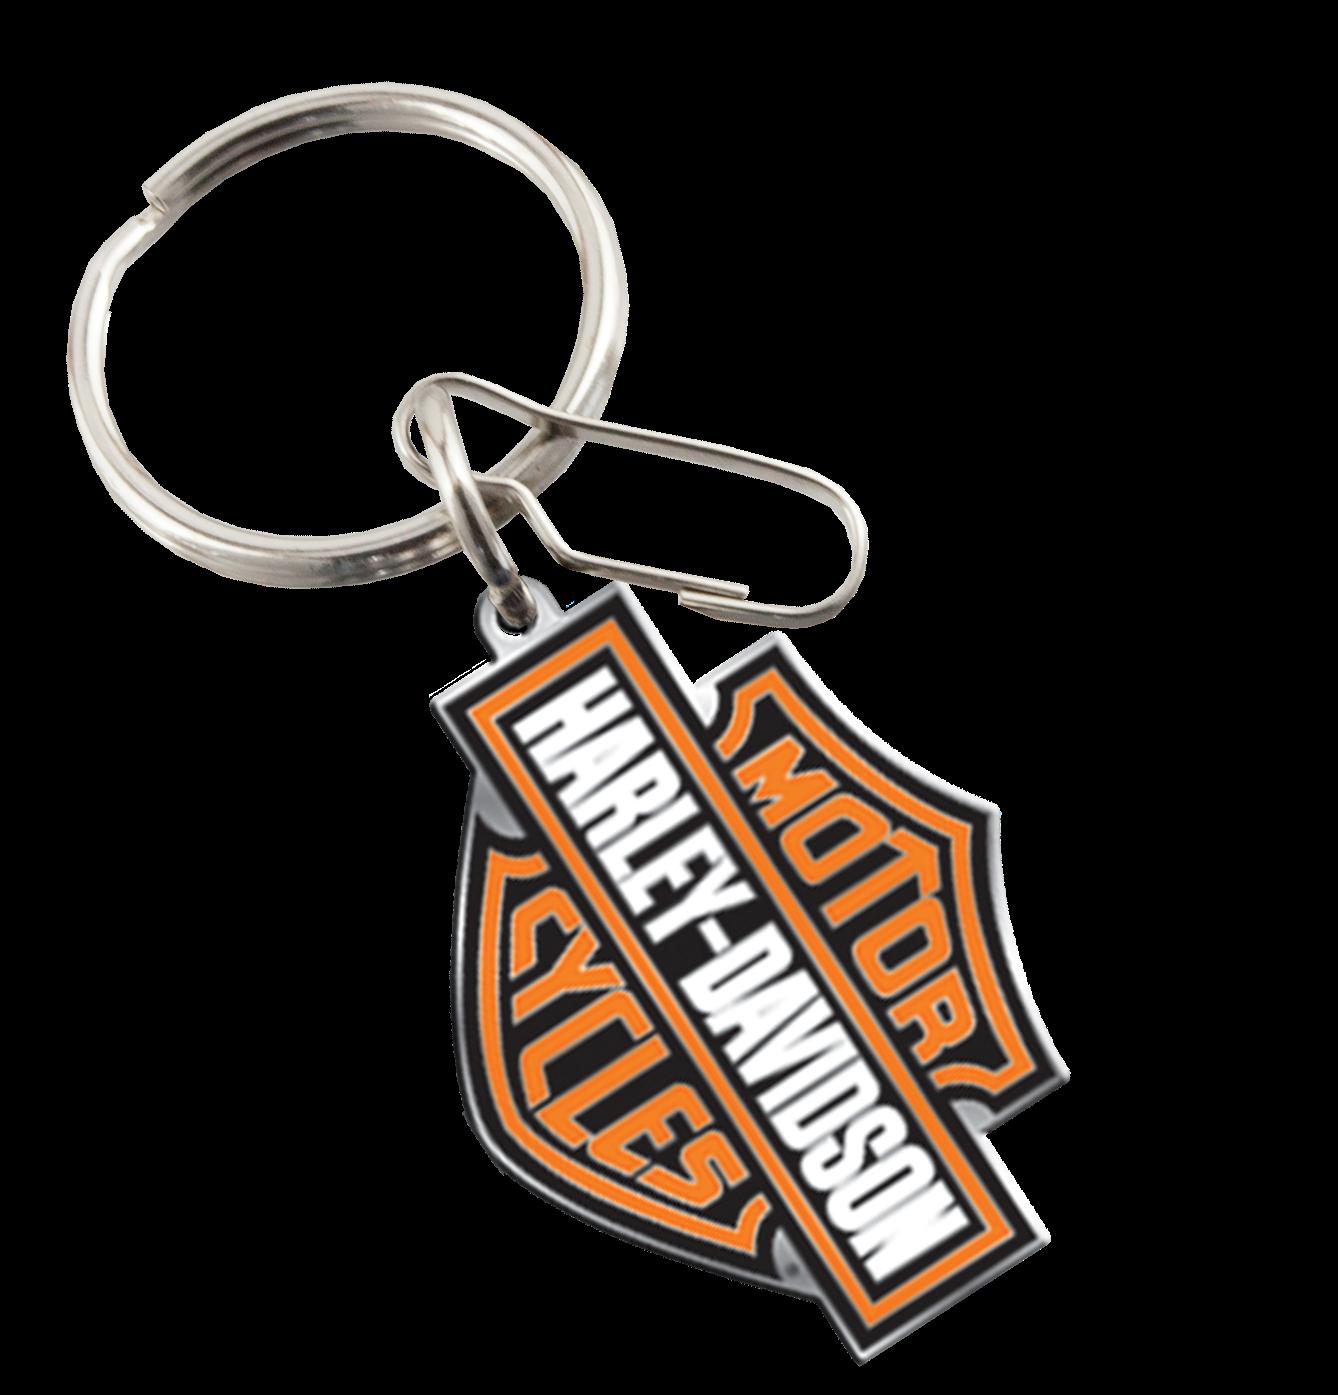 My Cool Car Stuff Harley Davidson 174 Enamel Key Chain